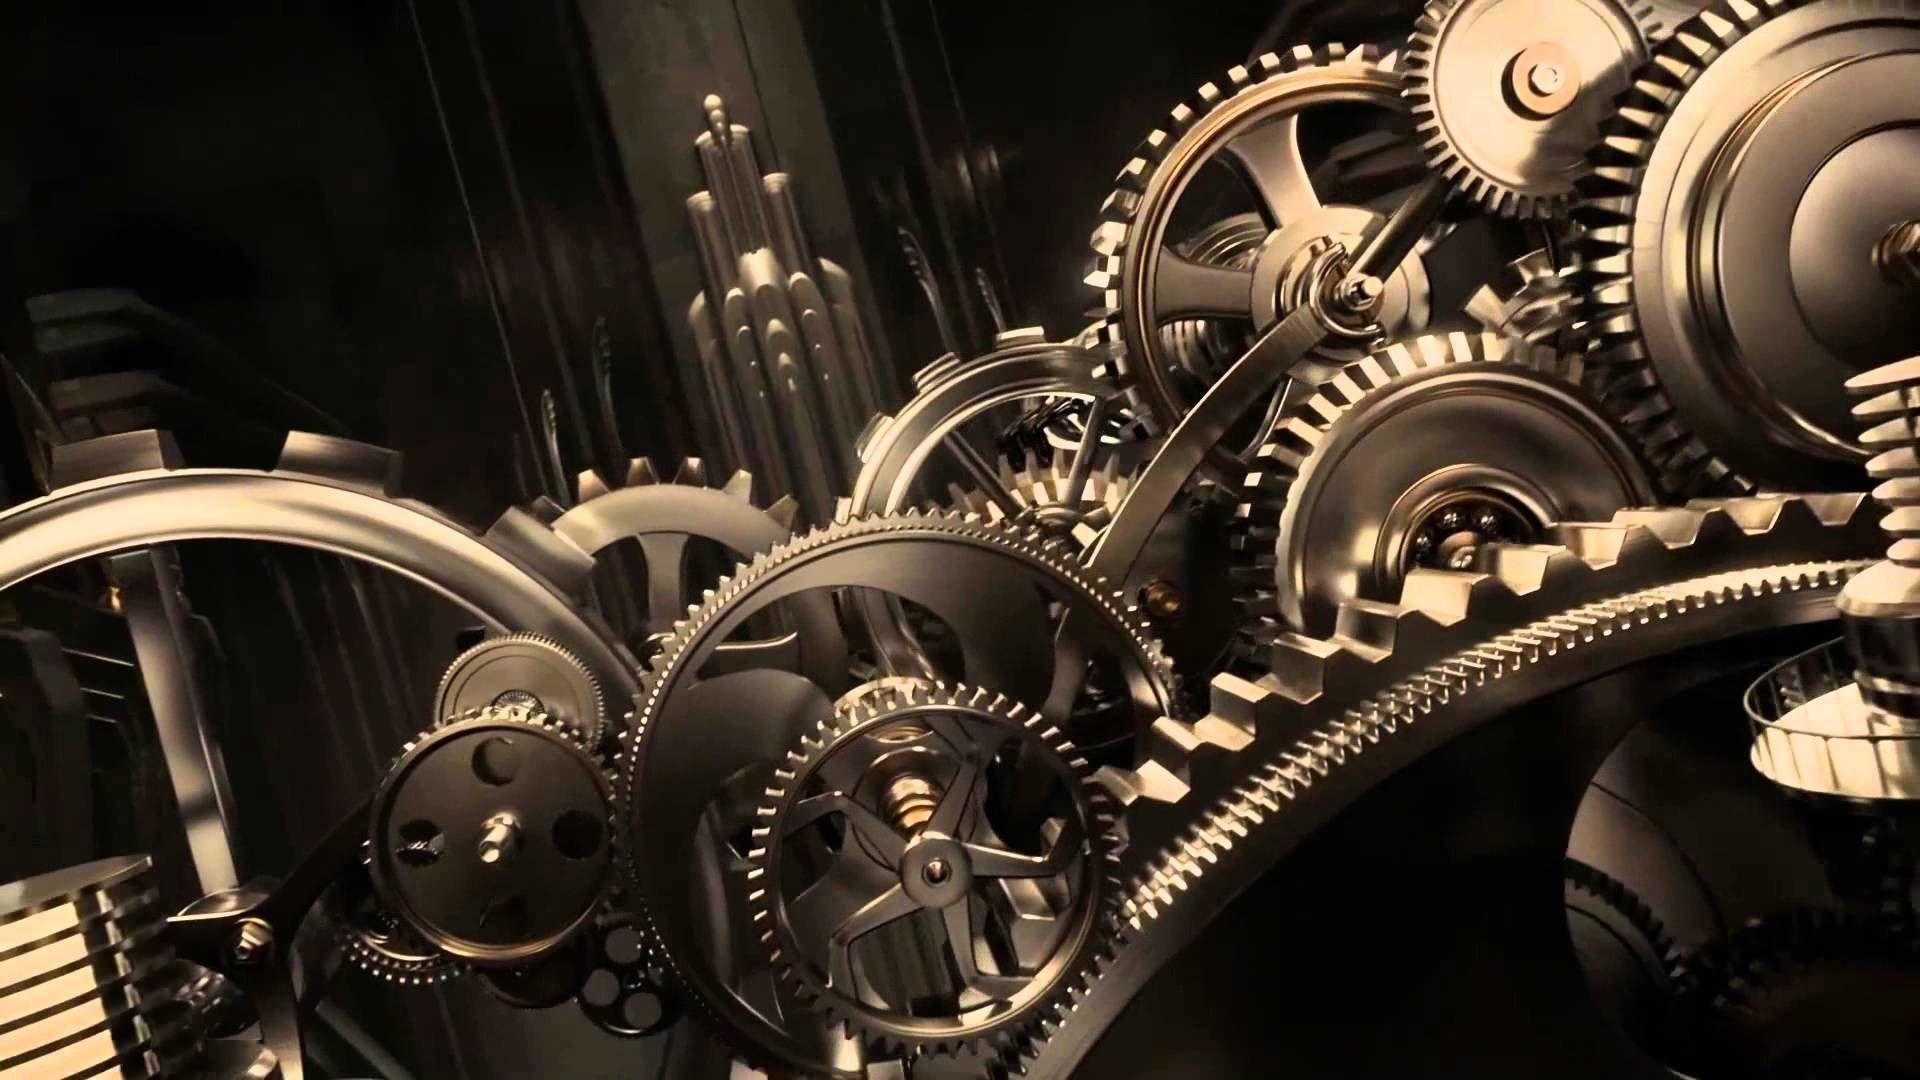 Mechanical Engineering Wallpapers Top Free Mechanical